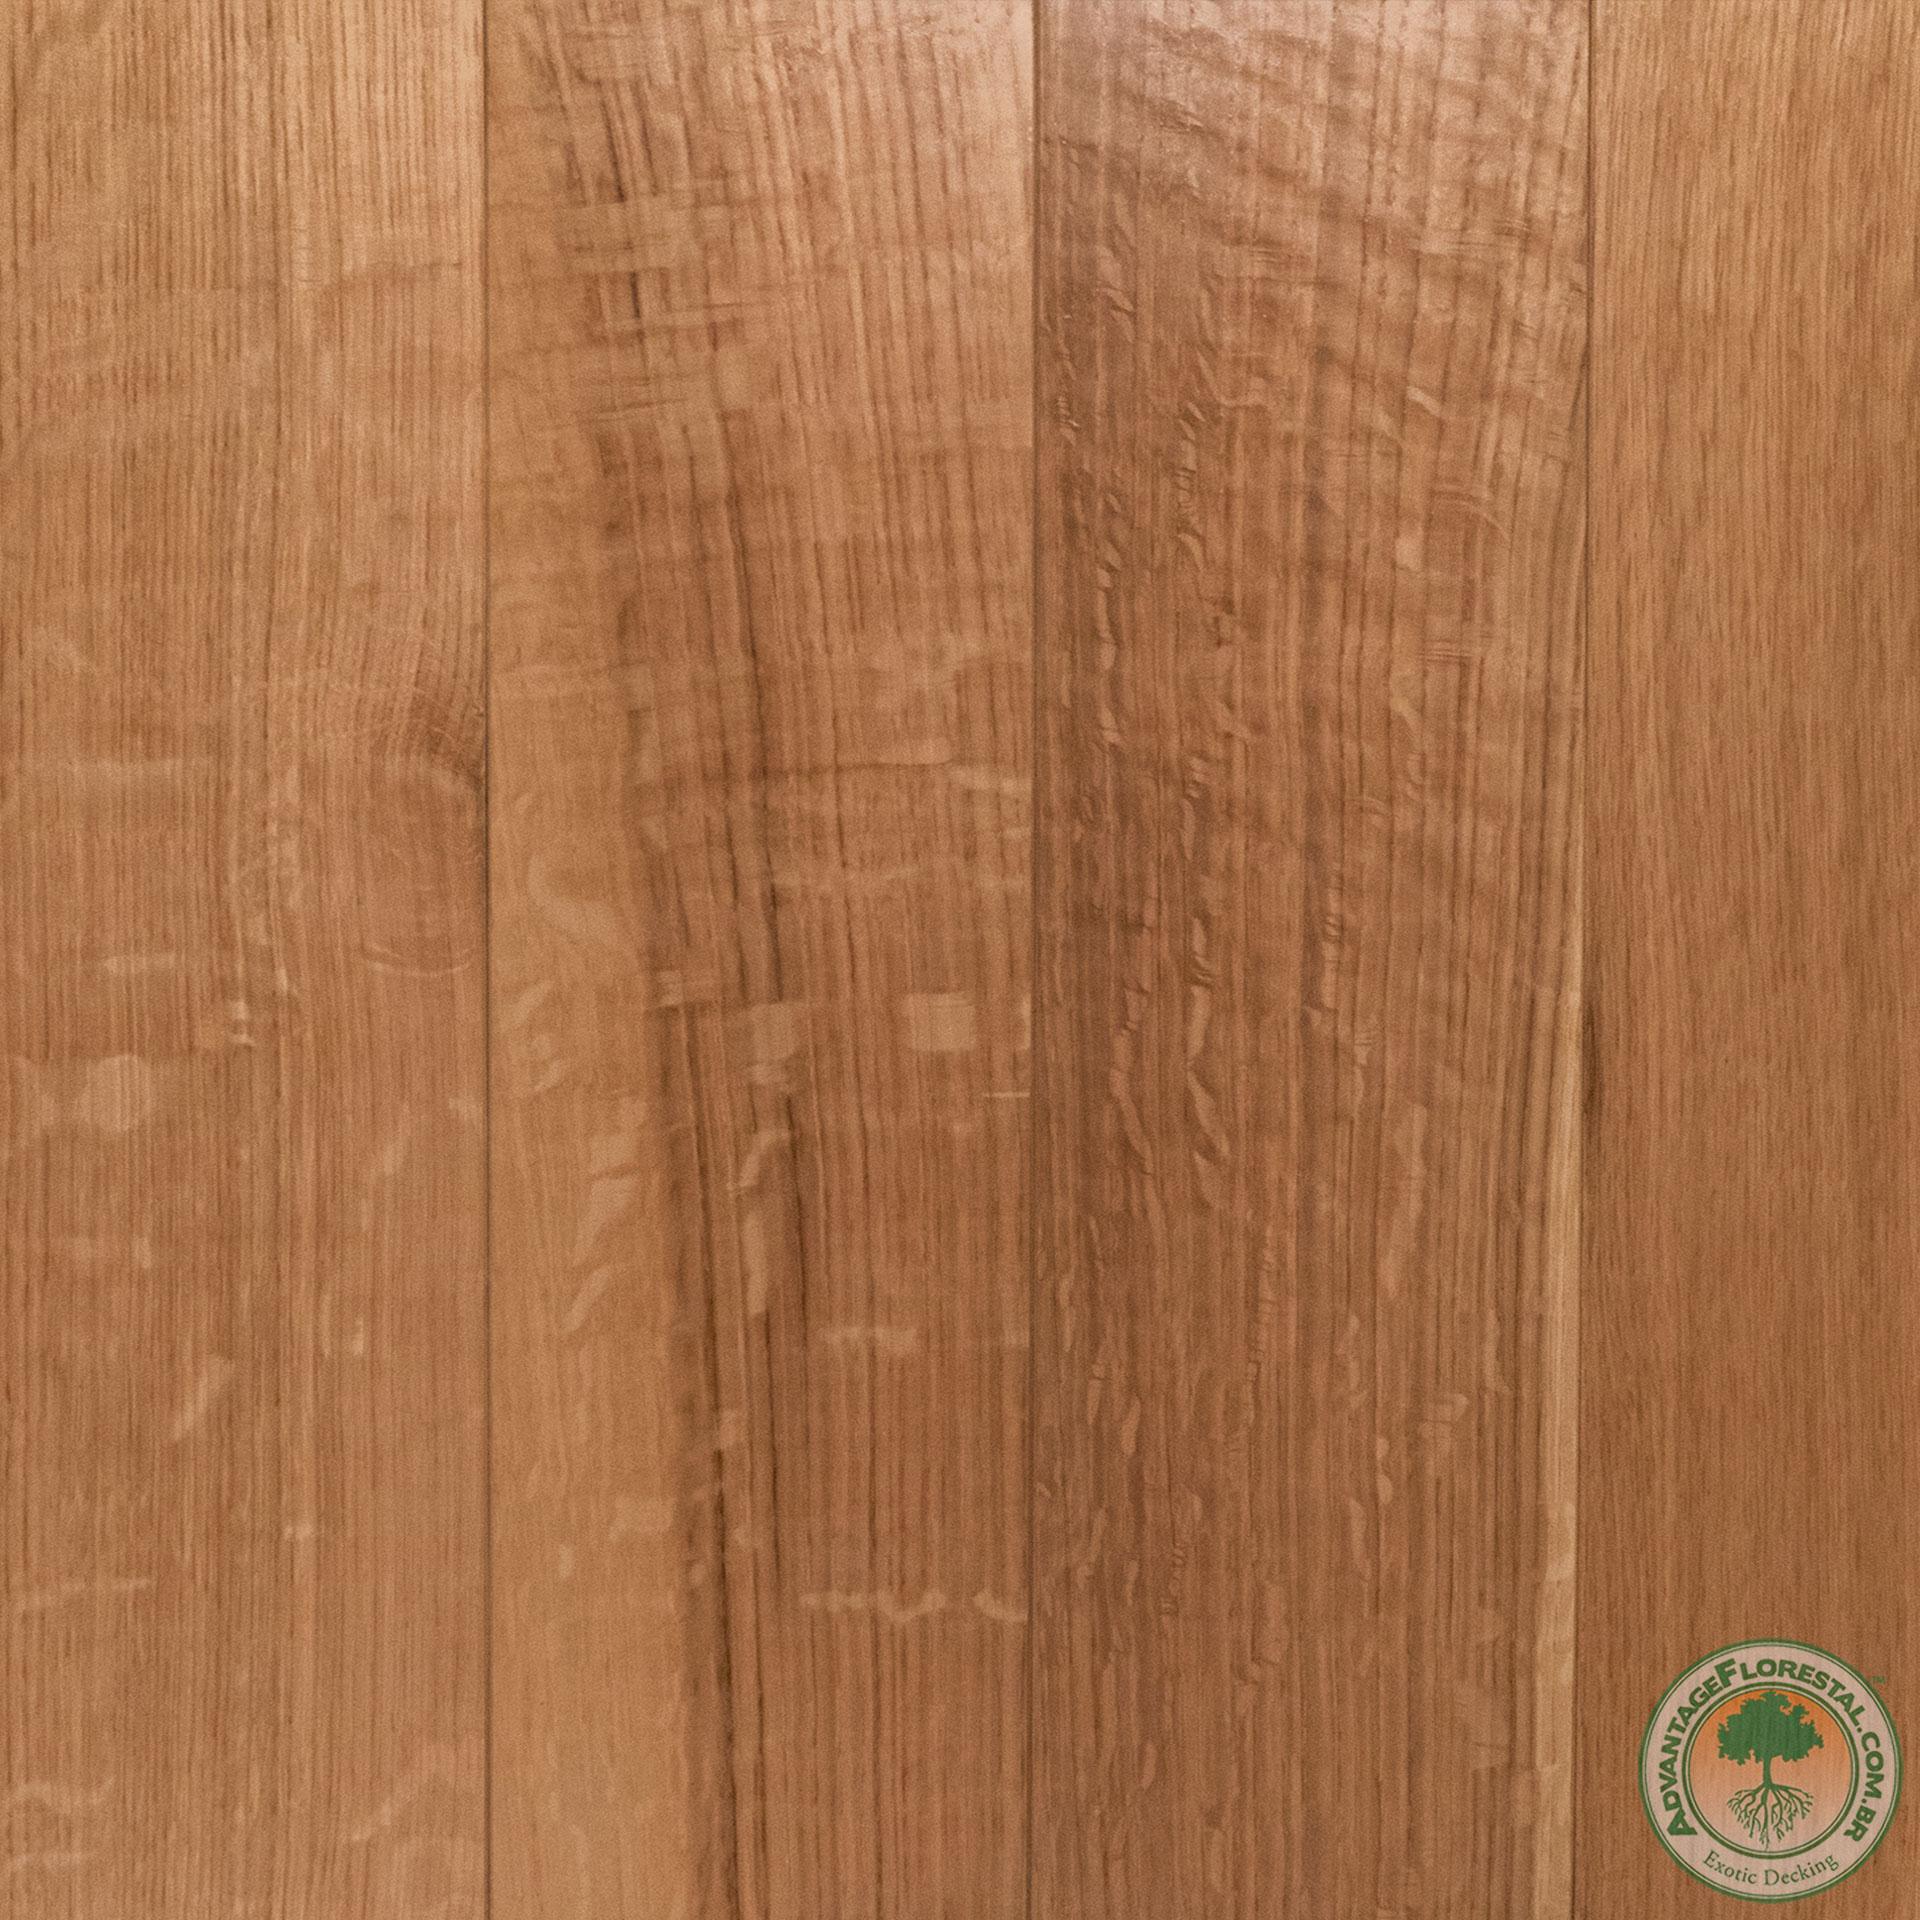 Wholesale Quarter Sawn White Oak Hardwood Flooring